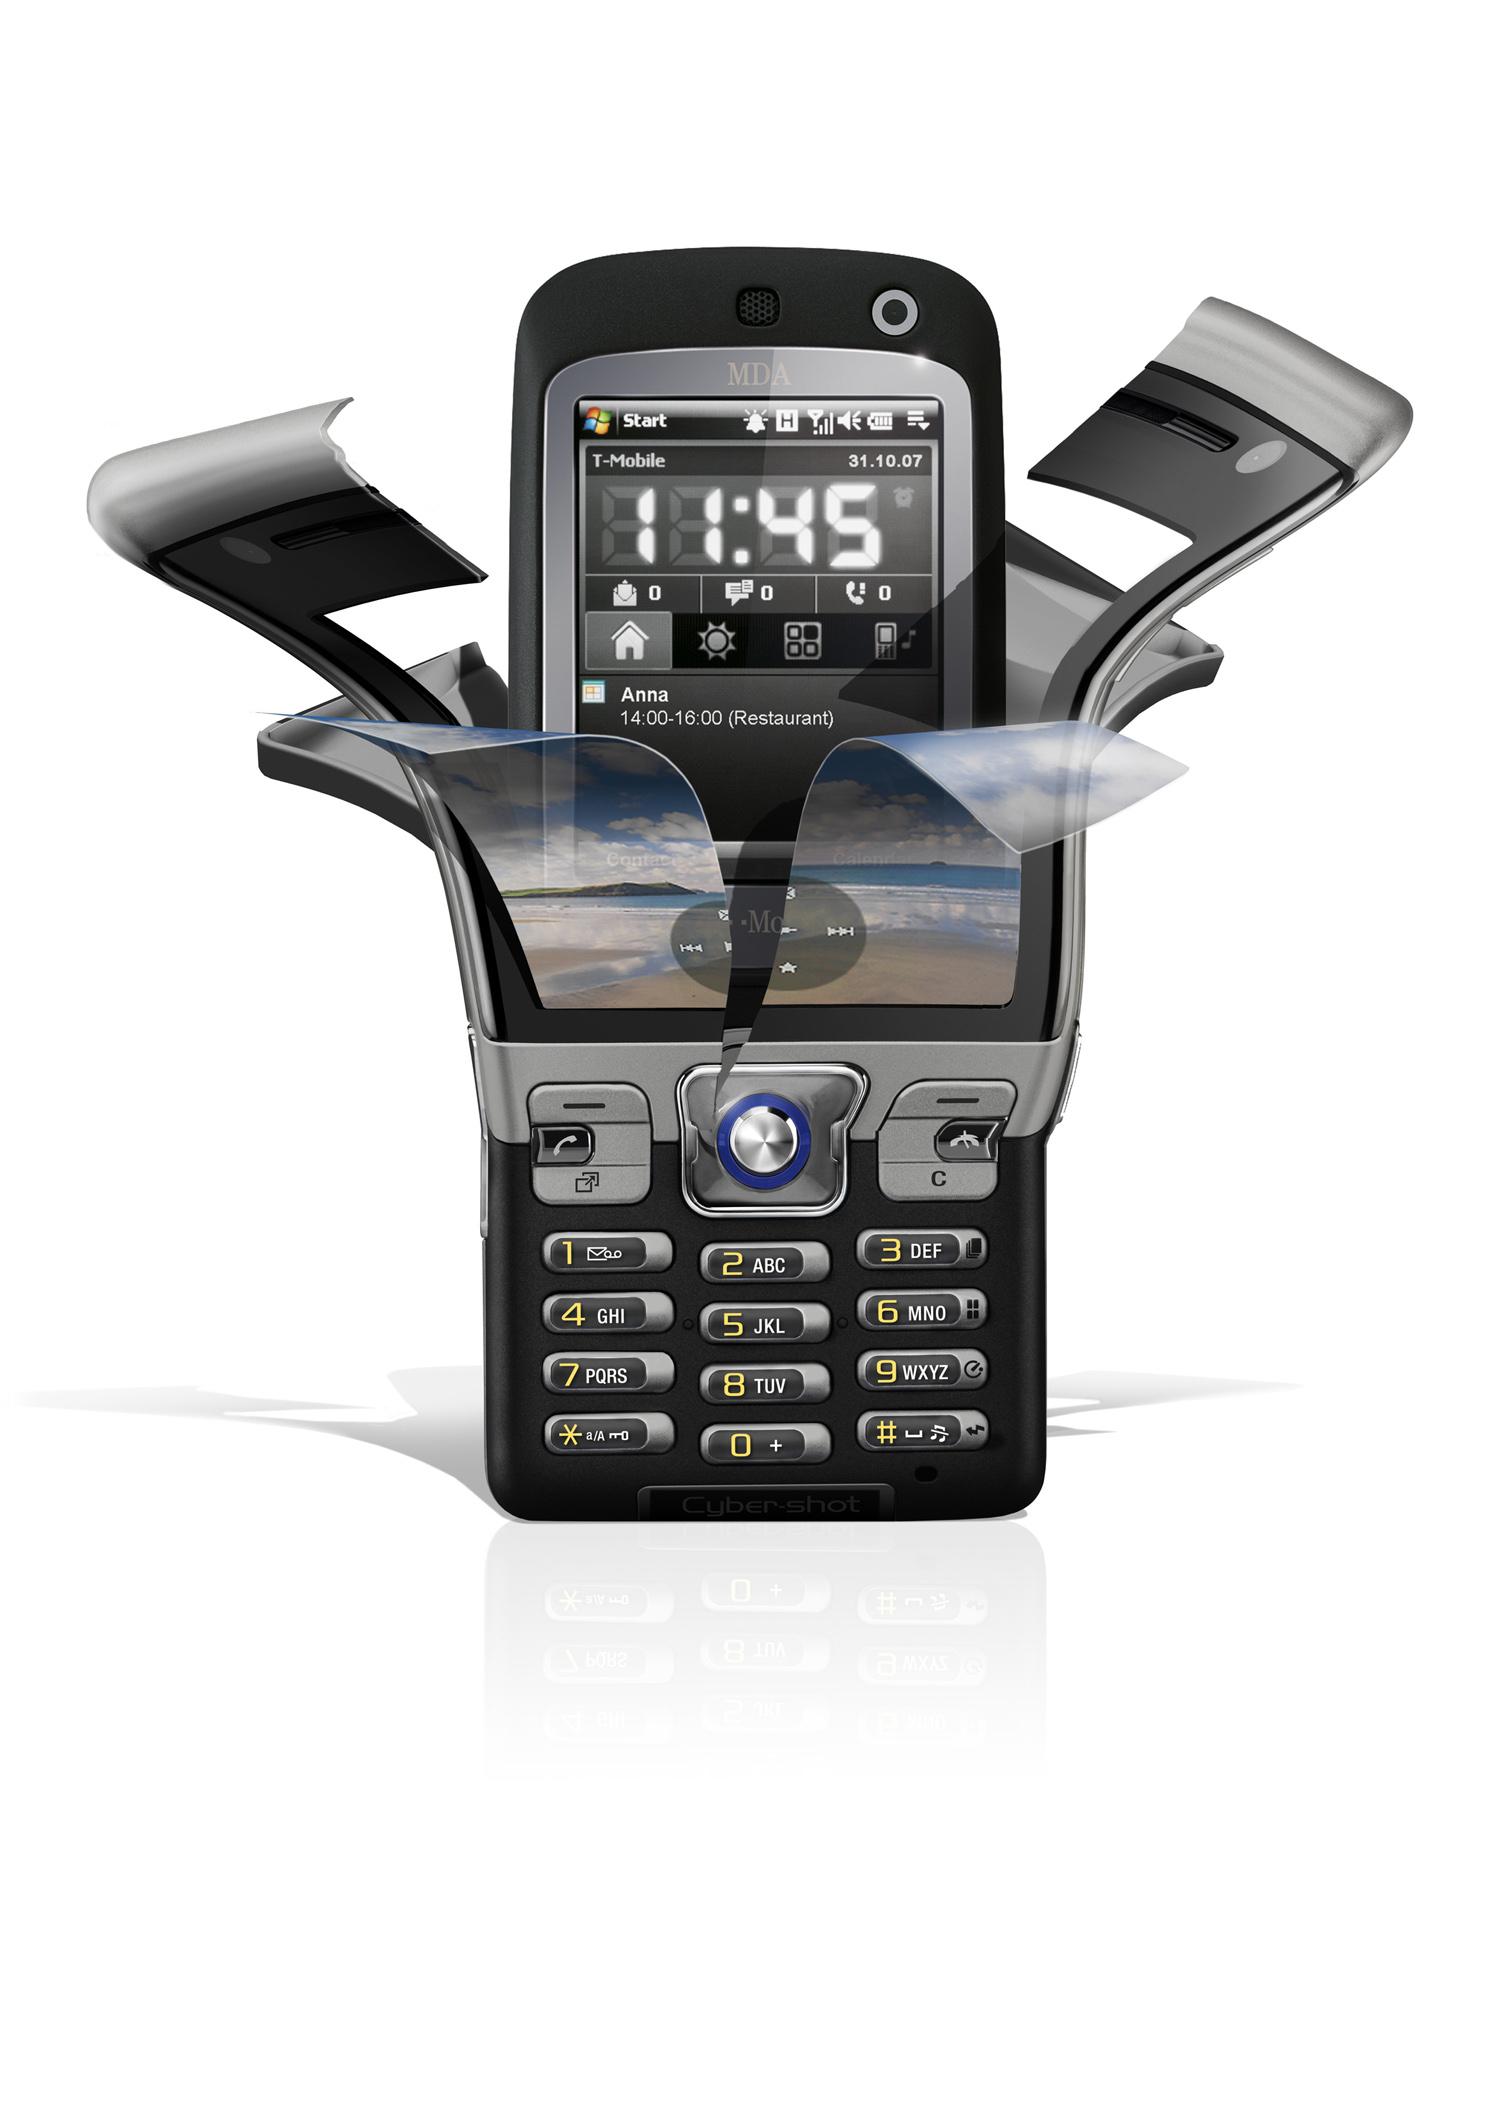 Phone Peel / Mobile Communications International